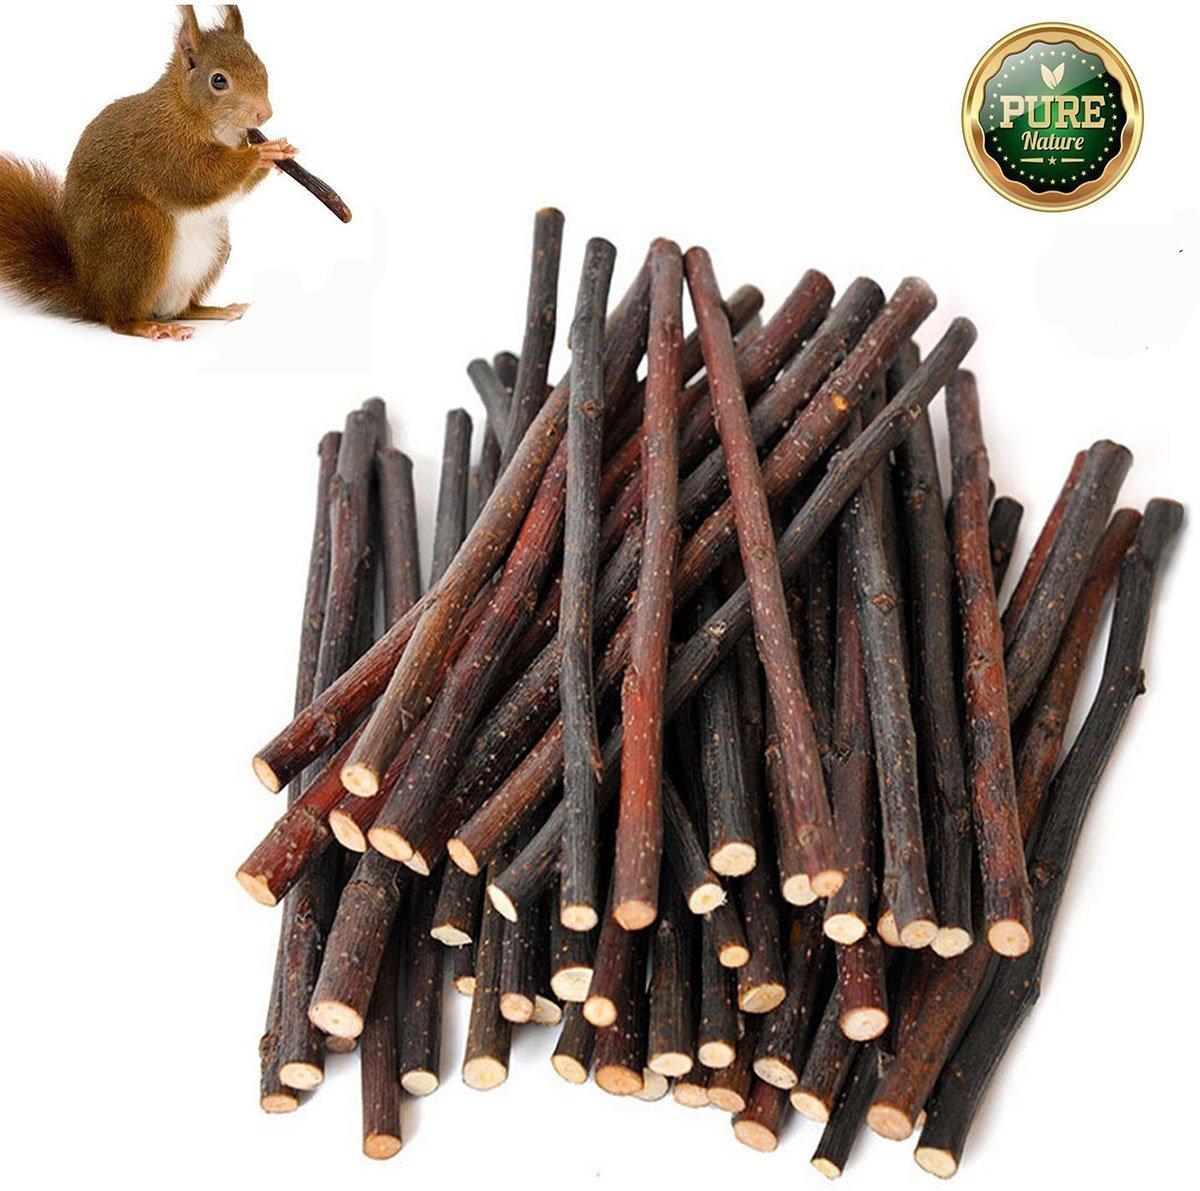 Simona Micah Organic Apple Sticks Wood Tree Branches Pet Snacks Chew Toys Branch Guinea Pigs Chinchilla Squirrel Rabbits Hamster Small Animals (500g)